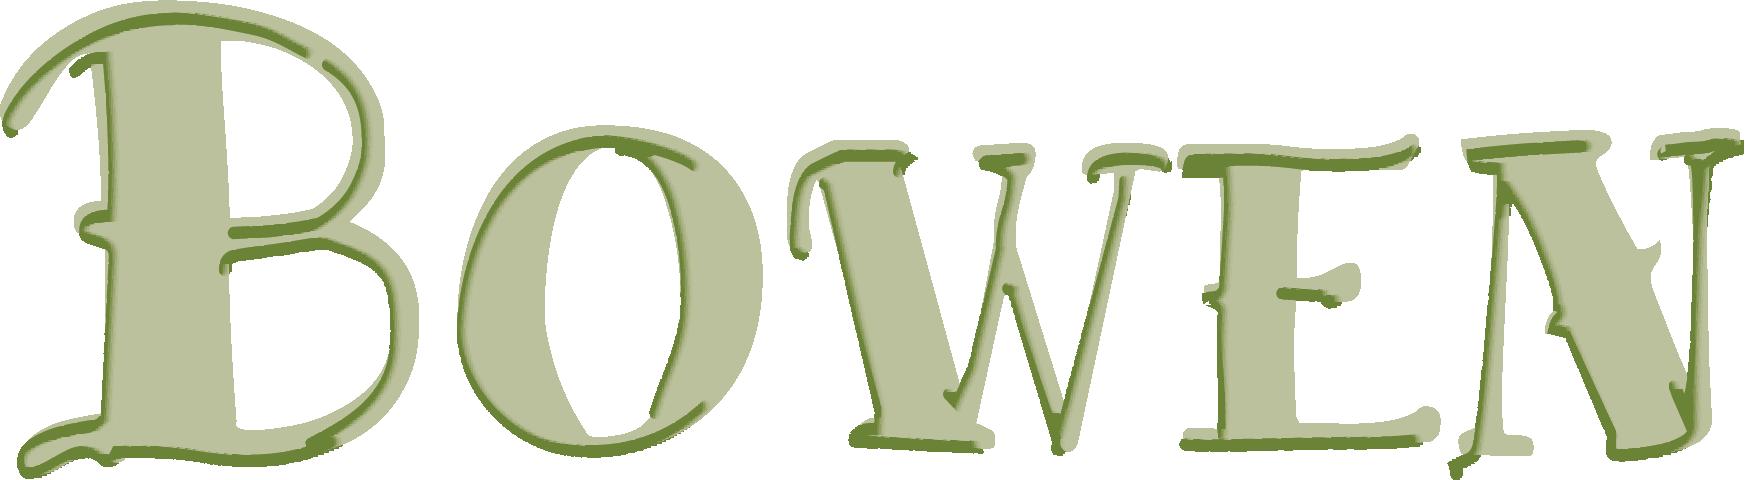 Bowen Text Logo-Green_4c